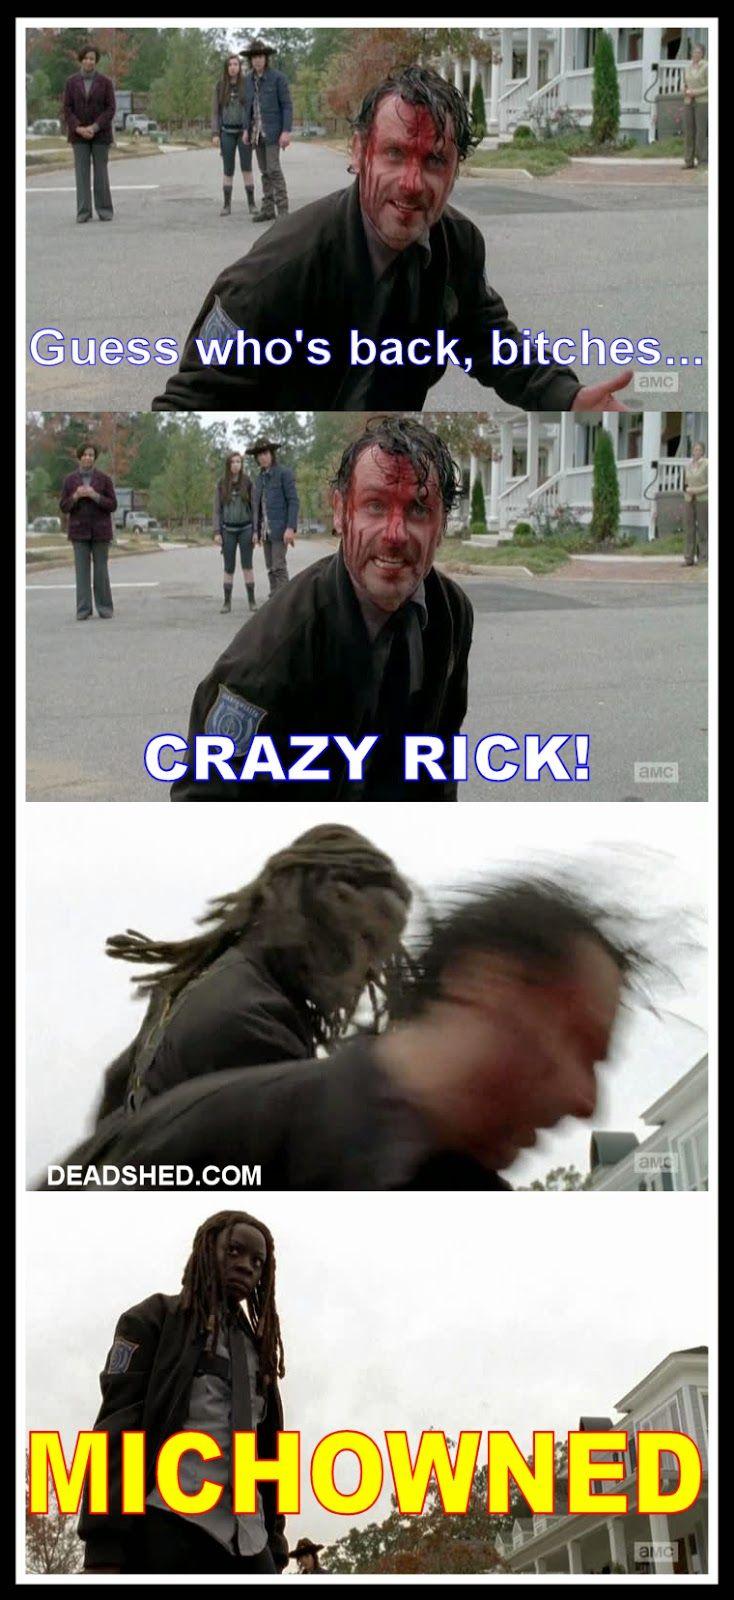 The_Walking_Dead_Season_5_Guess_Back_Crazy_Rick_Grimes_Michowned_Michonne_5x15_DeadShed.jpg 734×1600 pixels